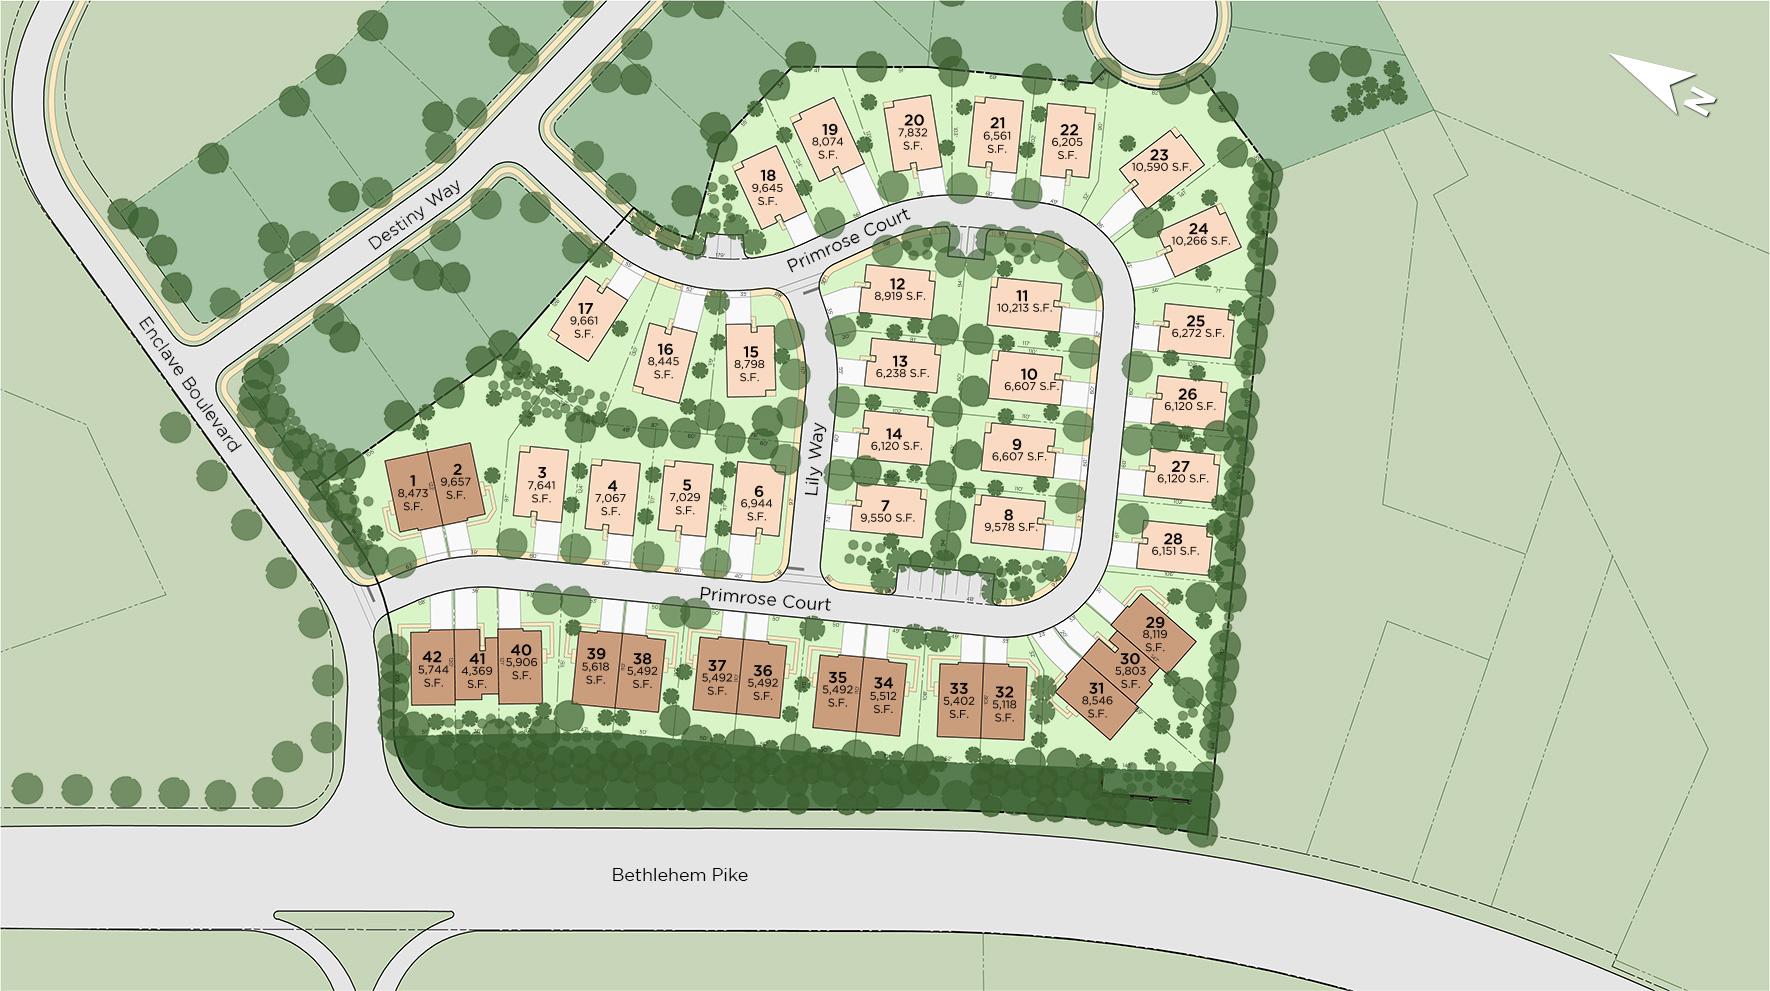 Meadows at Parkview - The Villas Site Plan